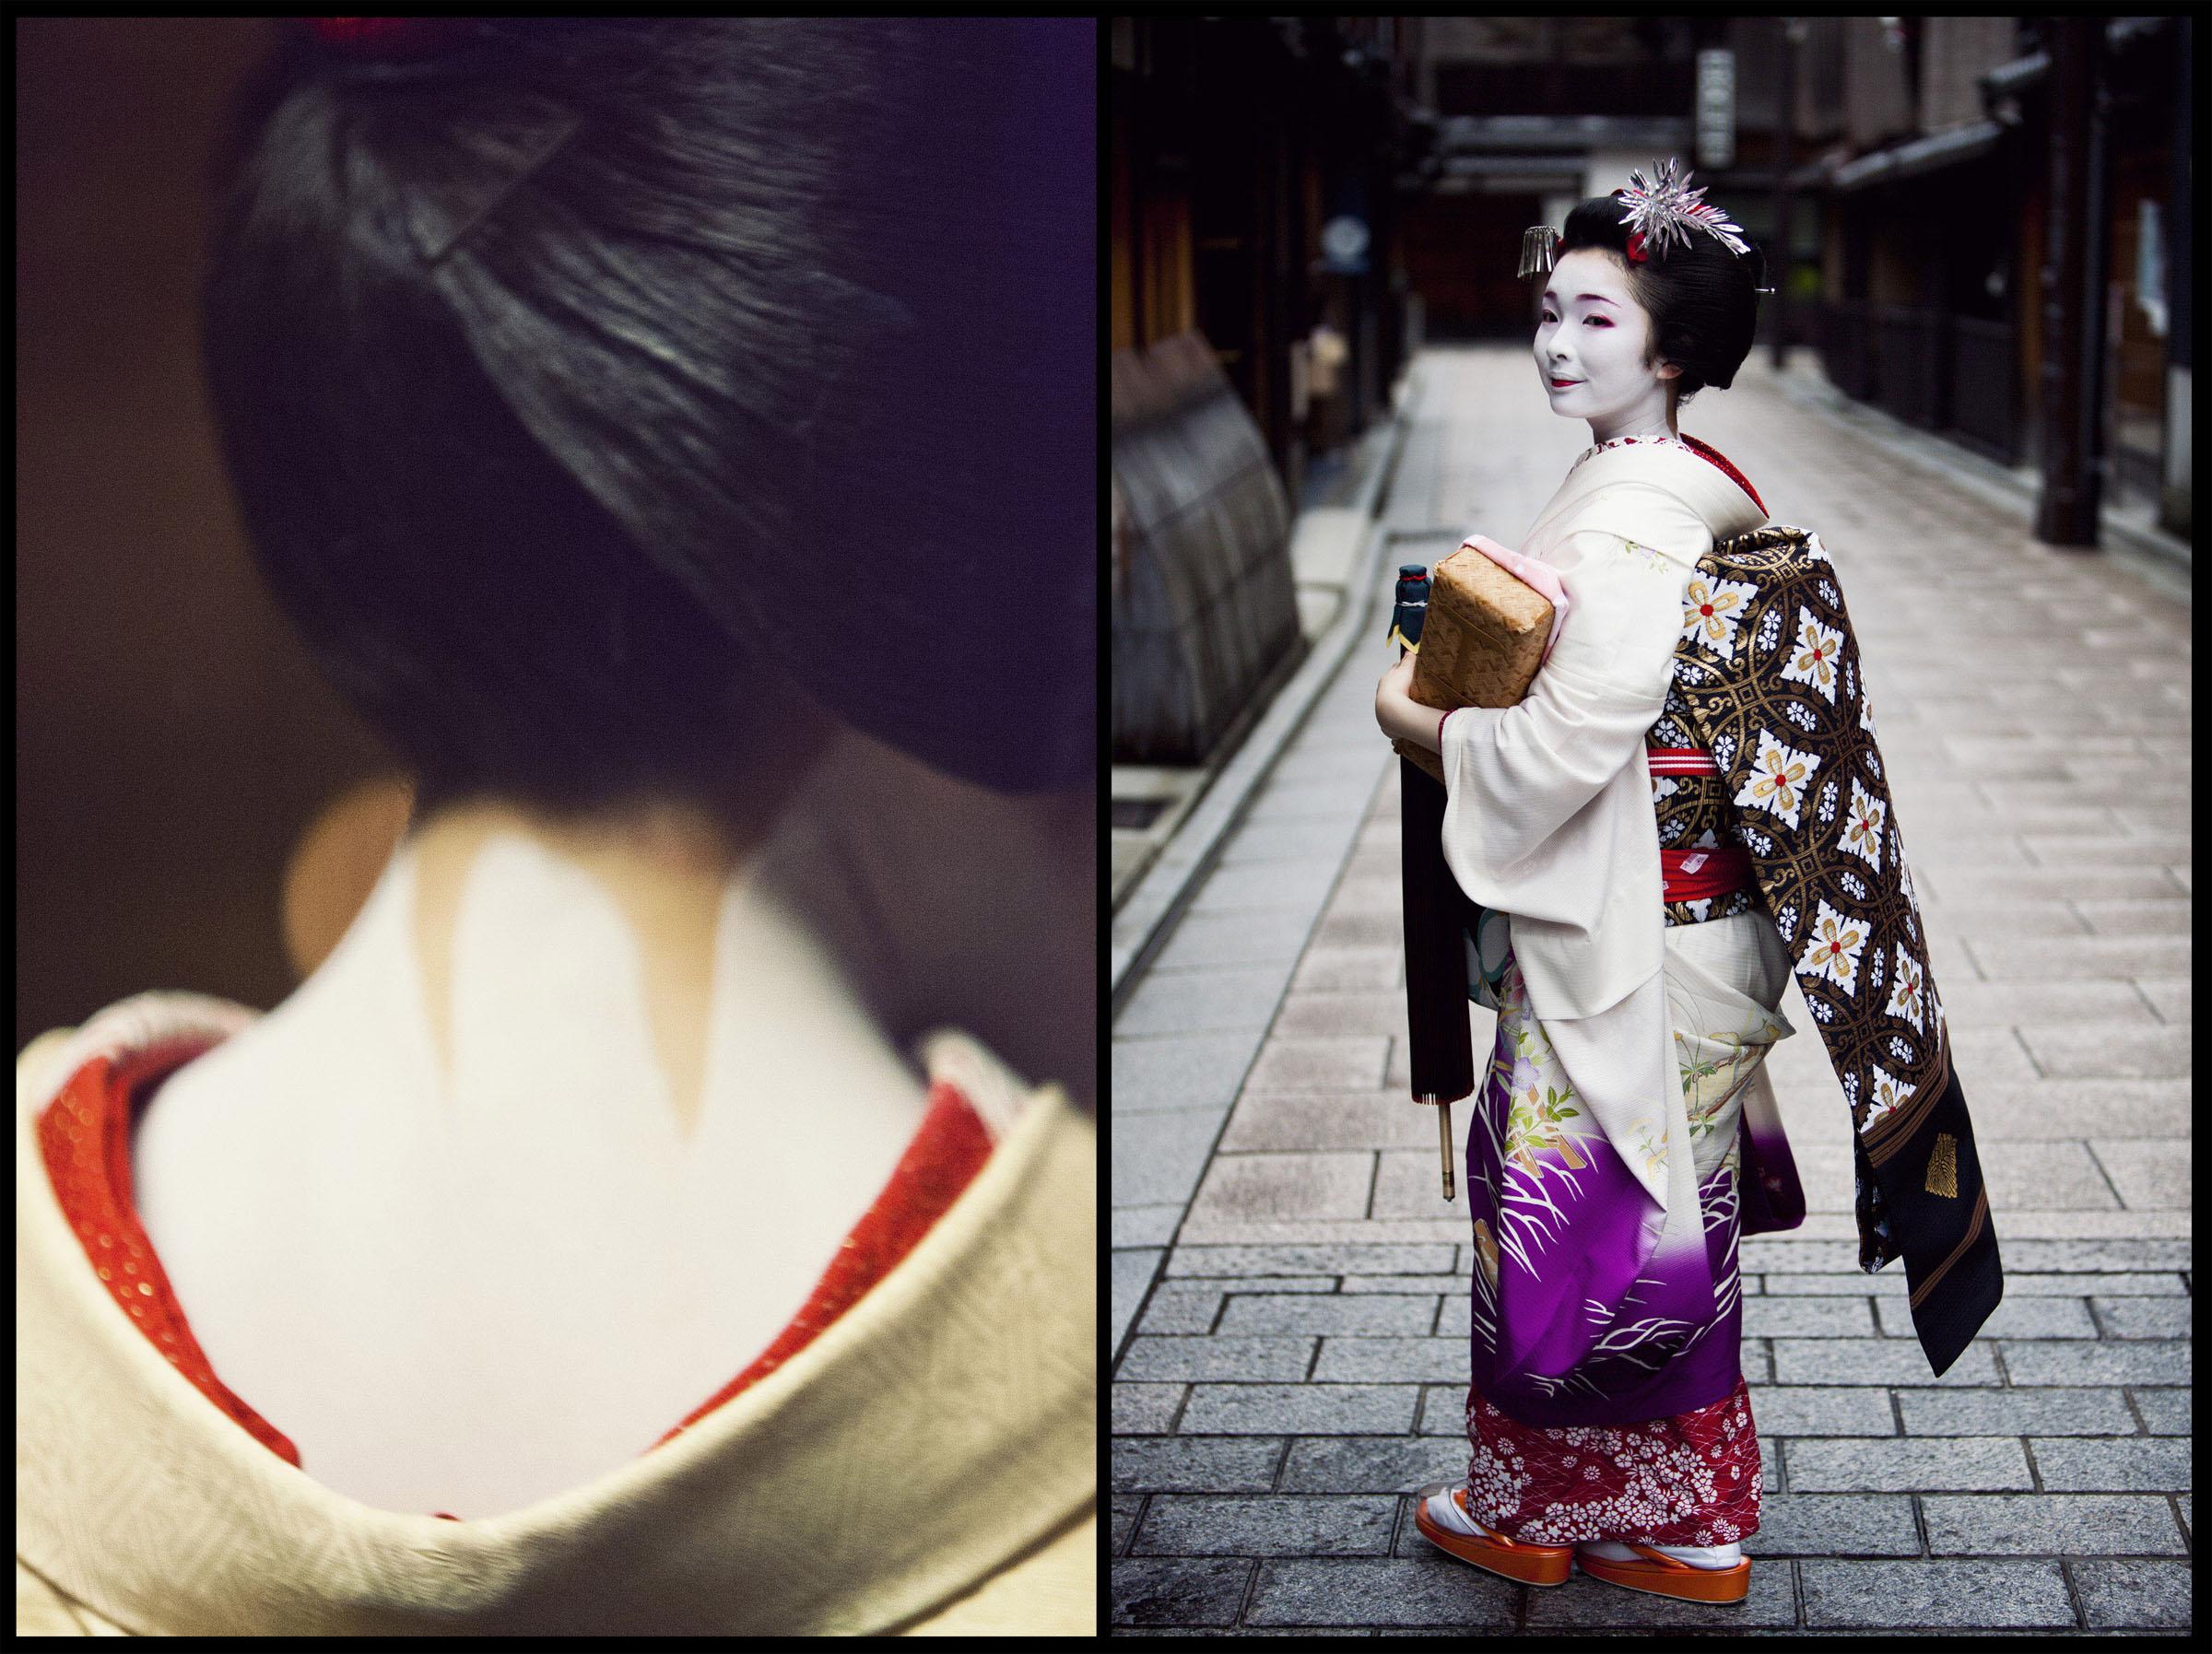 Geishas in Gion, Japan.